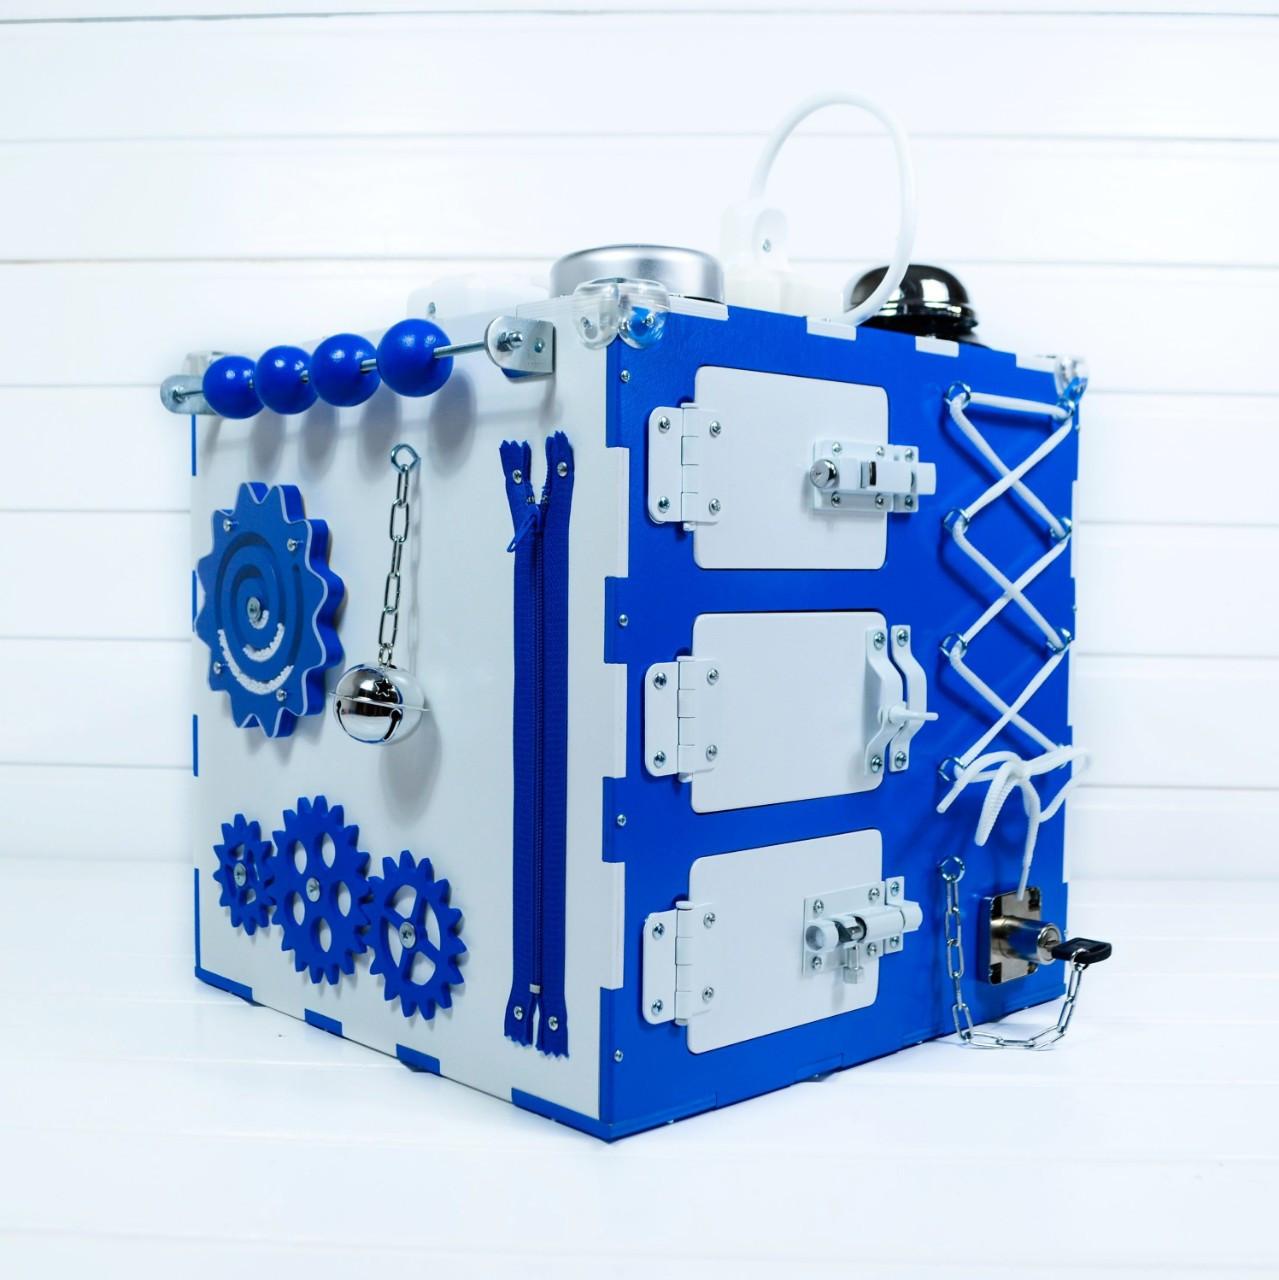 Развивающая игрушка Tornado Busy Cube Бело-синяя (hub_cqND66022)